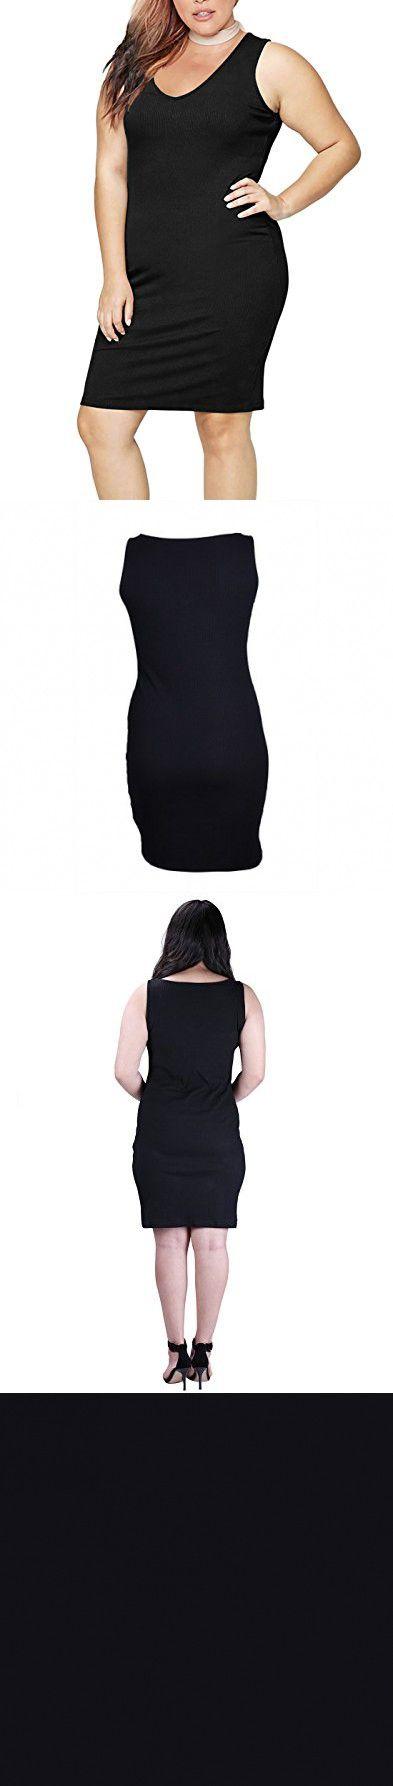 HDE Womens Plus Size Tank Top Dress Bodycon Casual Basic Sleeveless V Neck  Tunic (Black b7c38b965